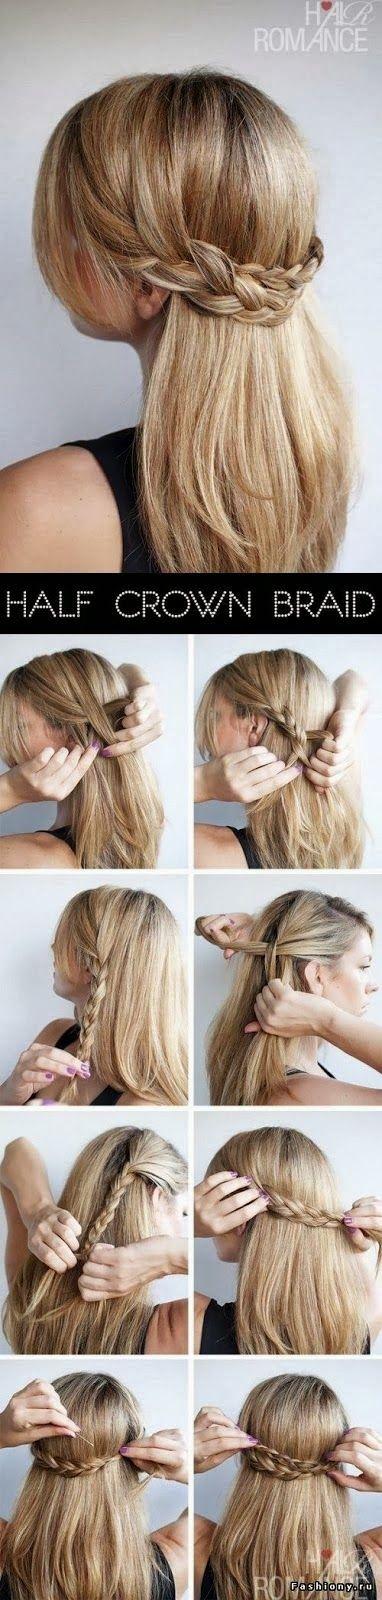 The-Best-20-Useful-Hair-Tutorials-On-Pinterest-3